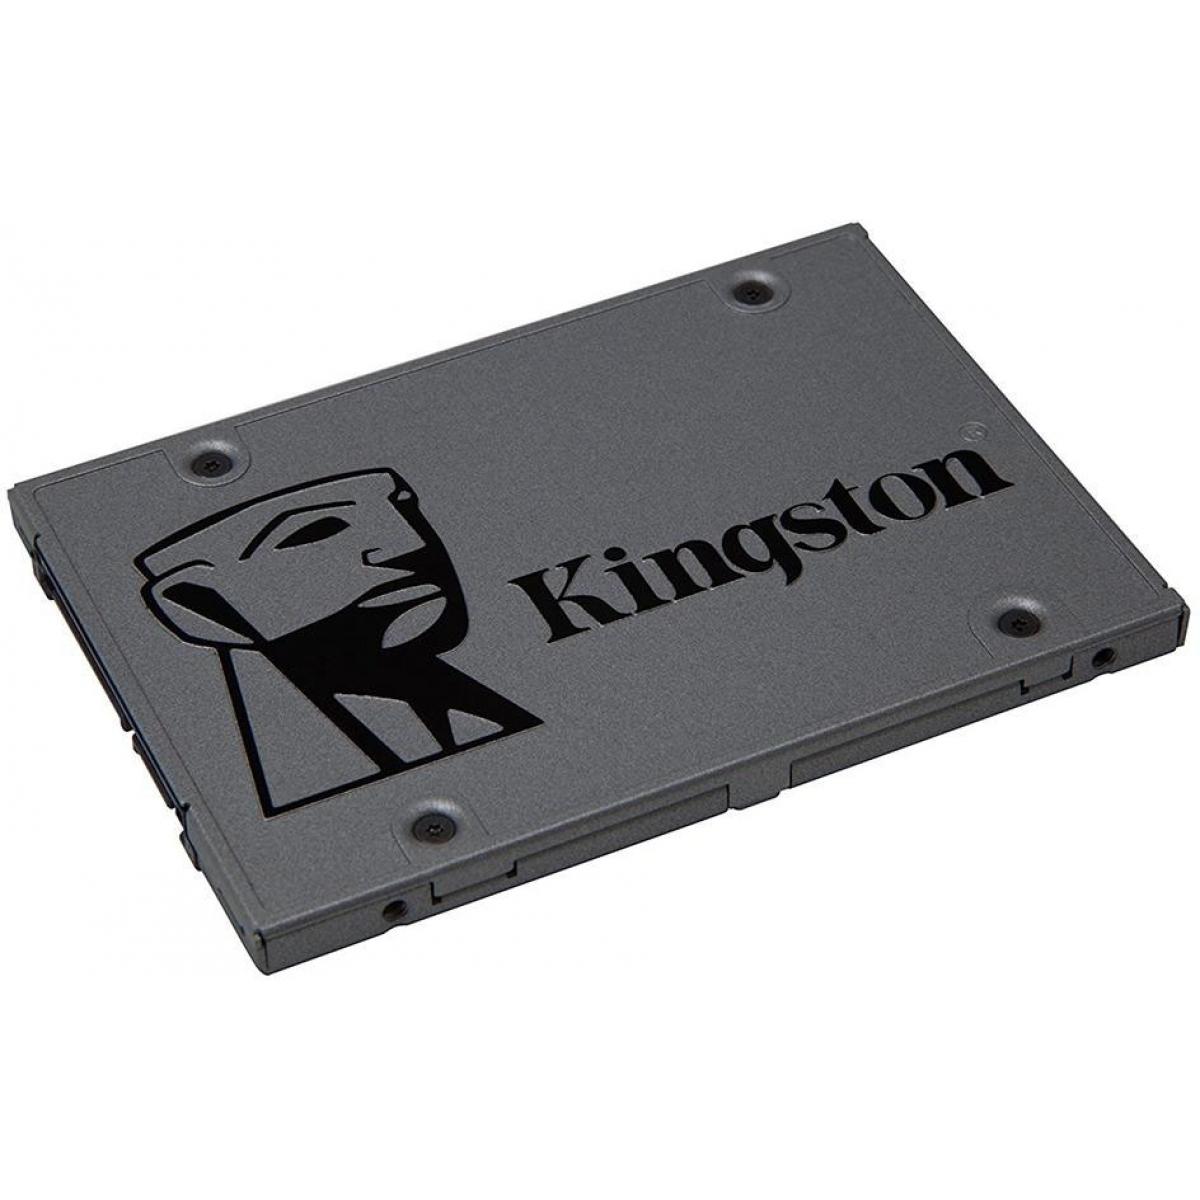 SSD Kingston UV500, 240GB, Sata III, Leitura 520MBs e Gravação 500MBs, SUV500/240G